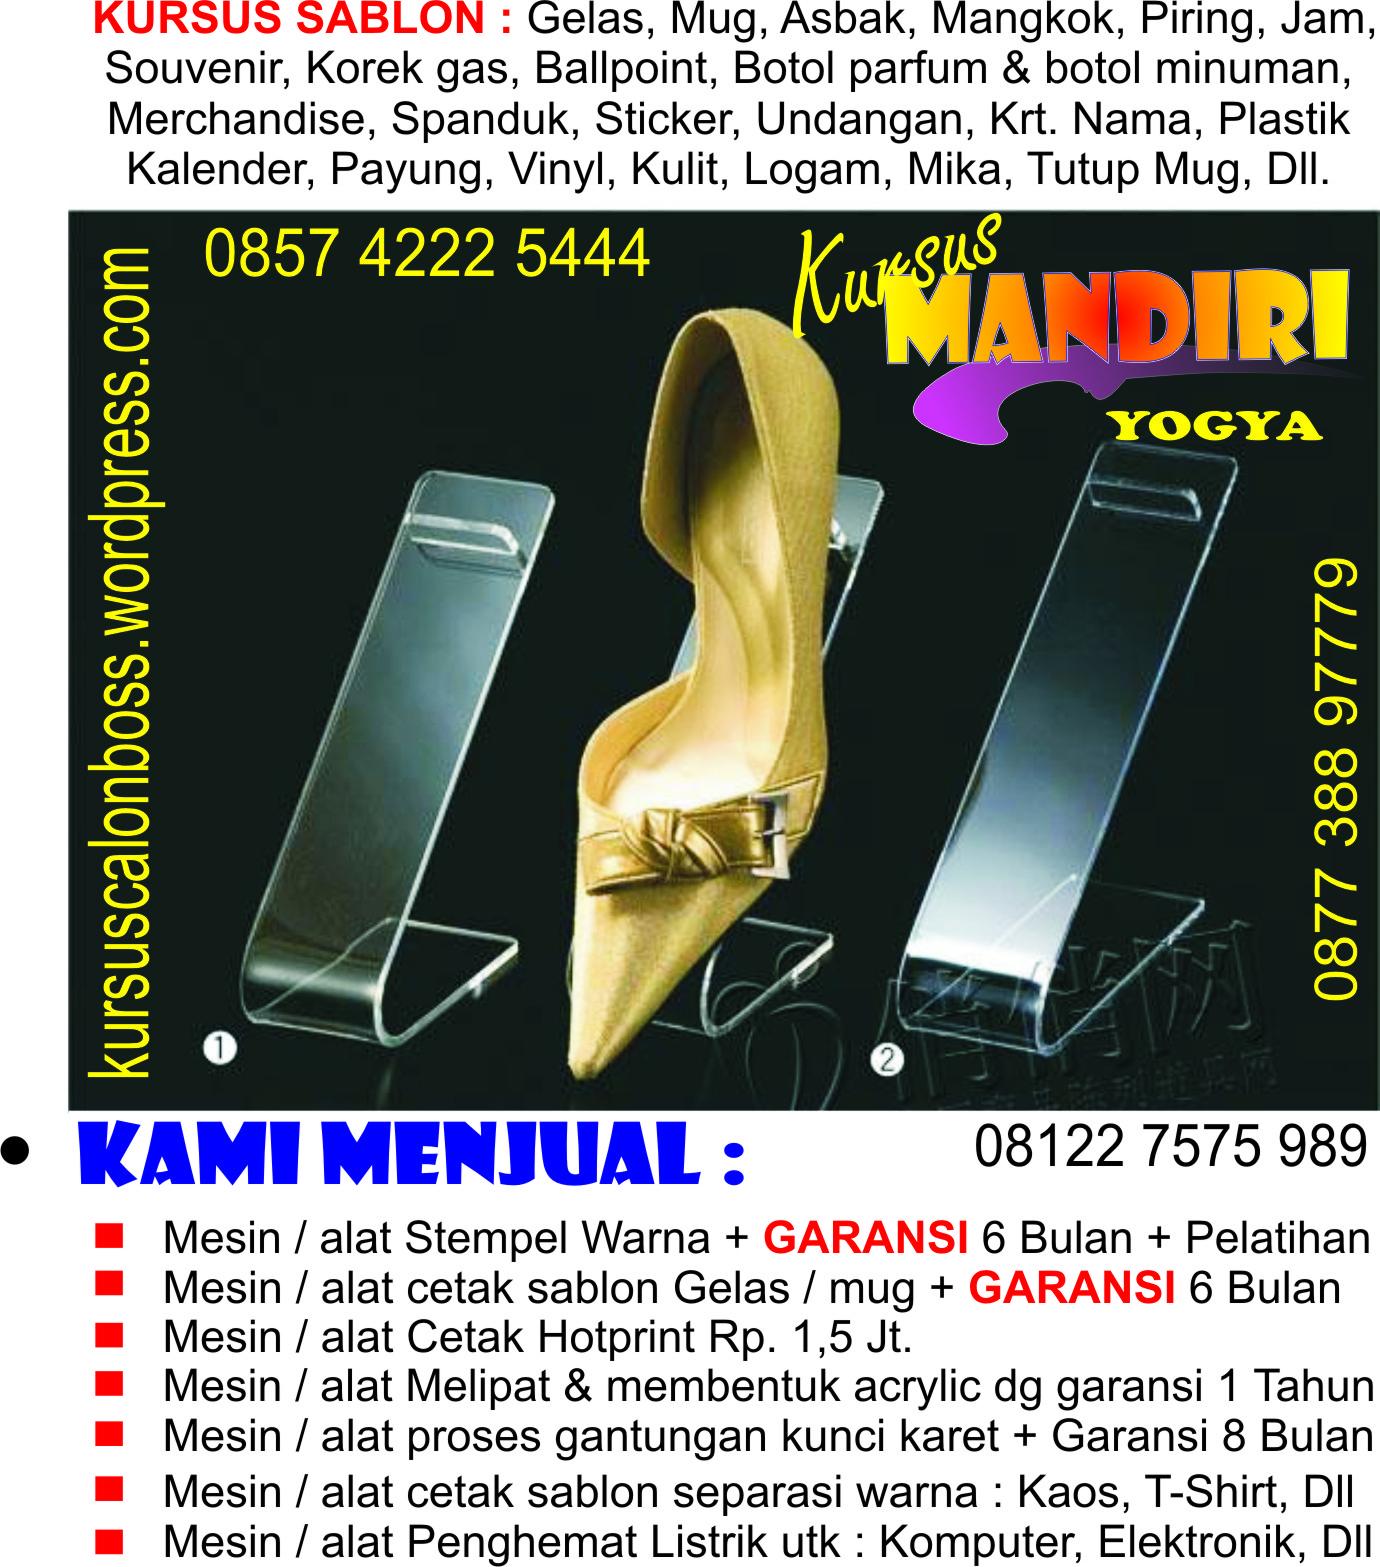 Jasa Desain Kartu Nama Brosur: Fiberglass, Sandblasting, Etsa Kaca, Emboss, Digital